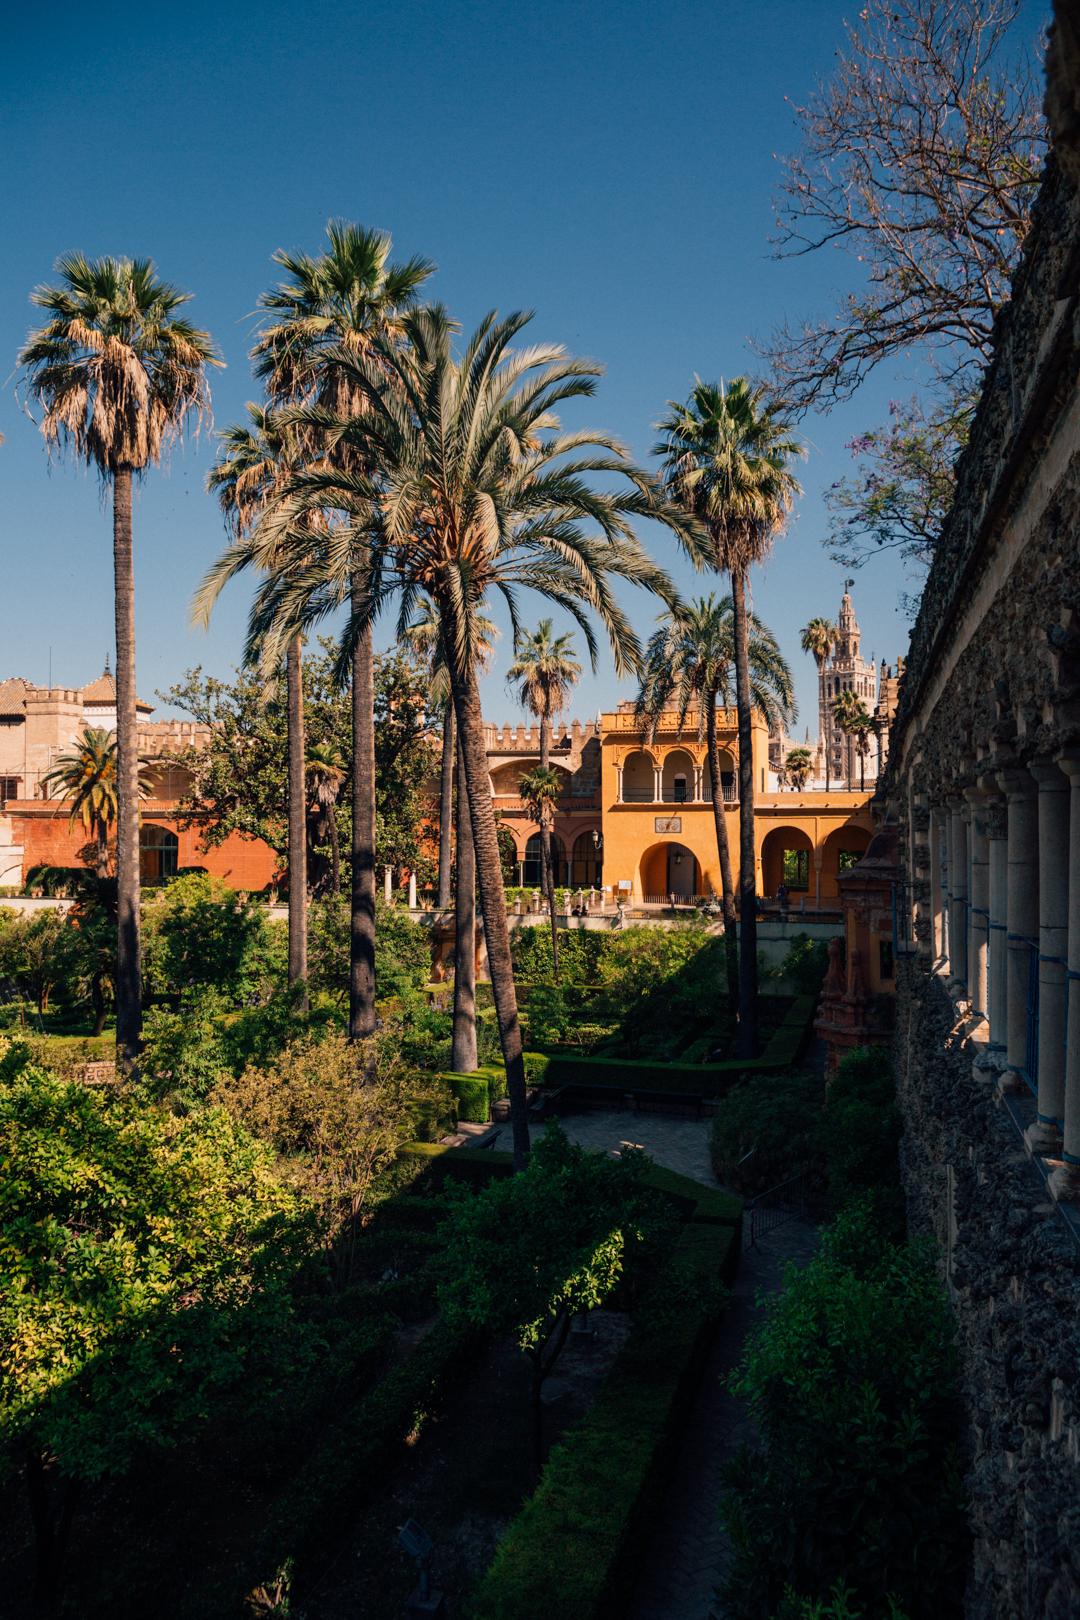 Visiting the Royal Alcazar of Seville